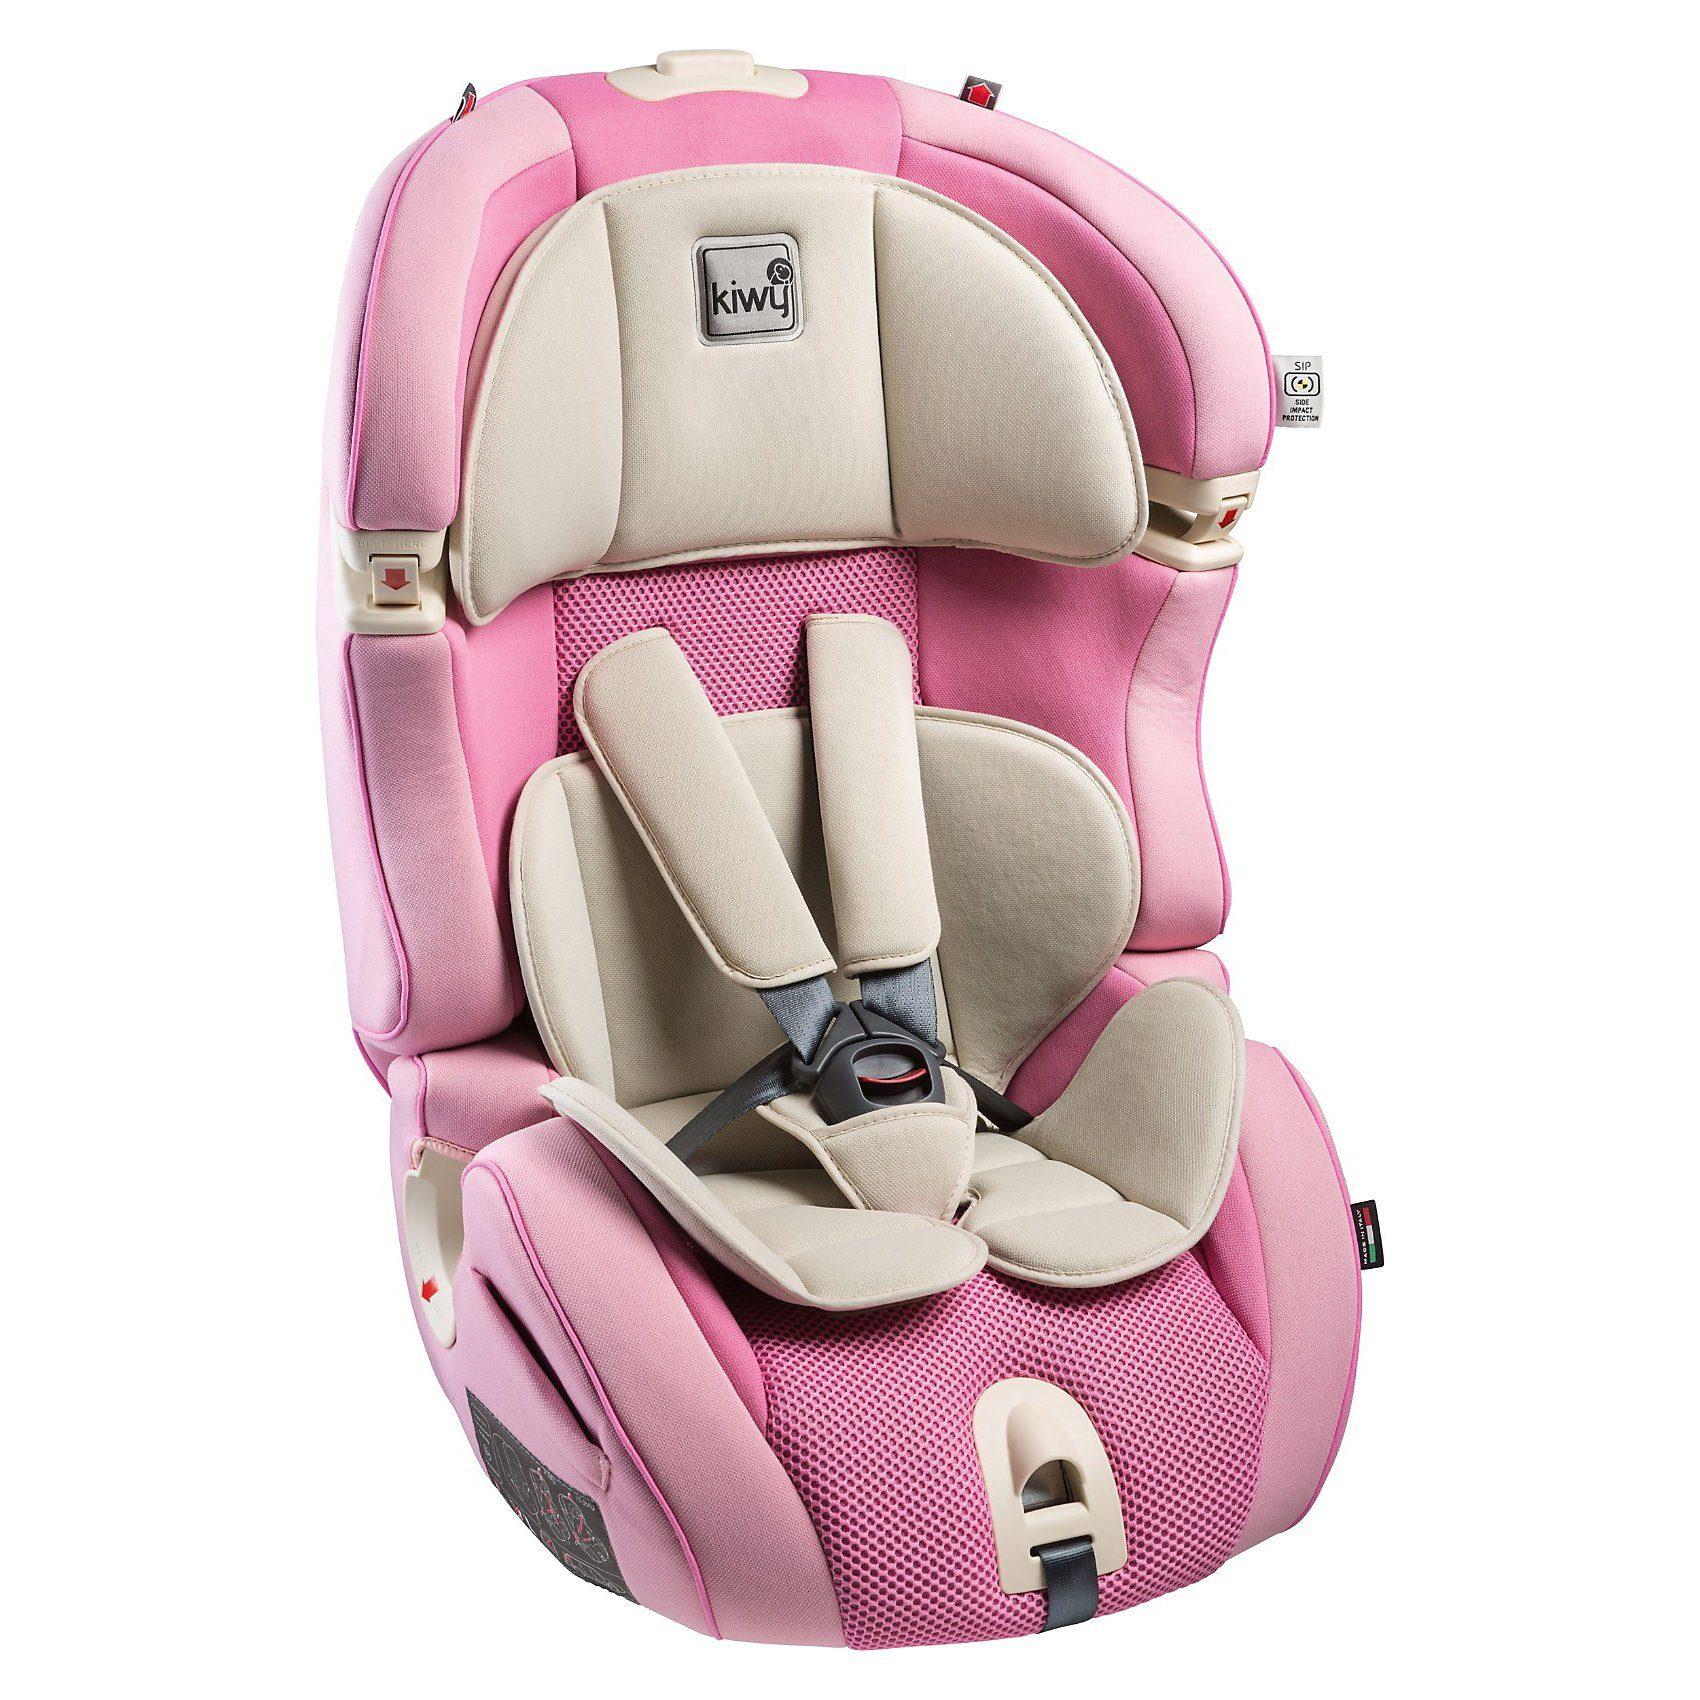 Kiwy Auto-Kindersitz SL123, Candy, 2016